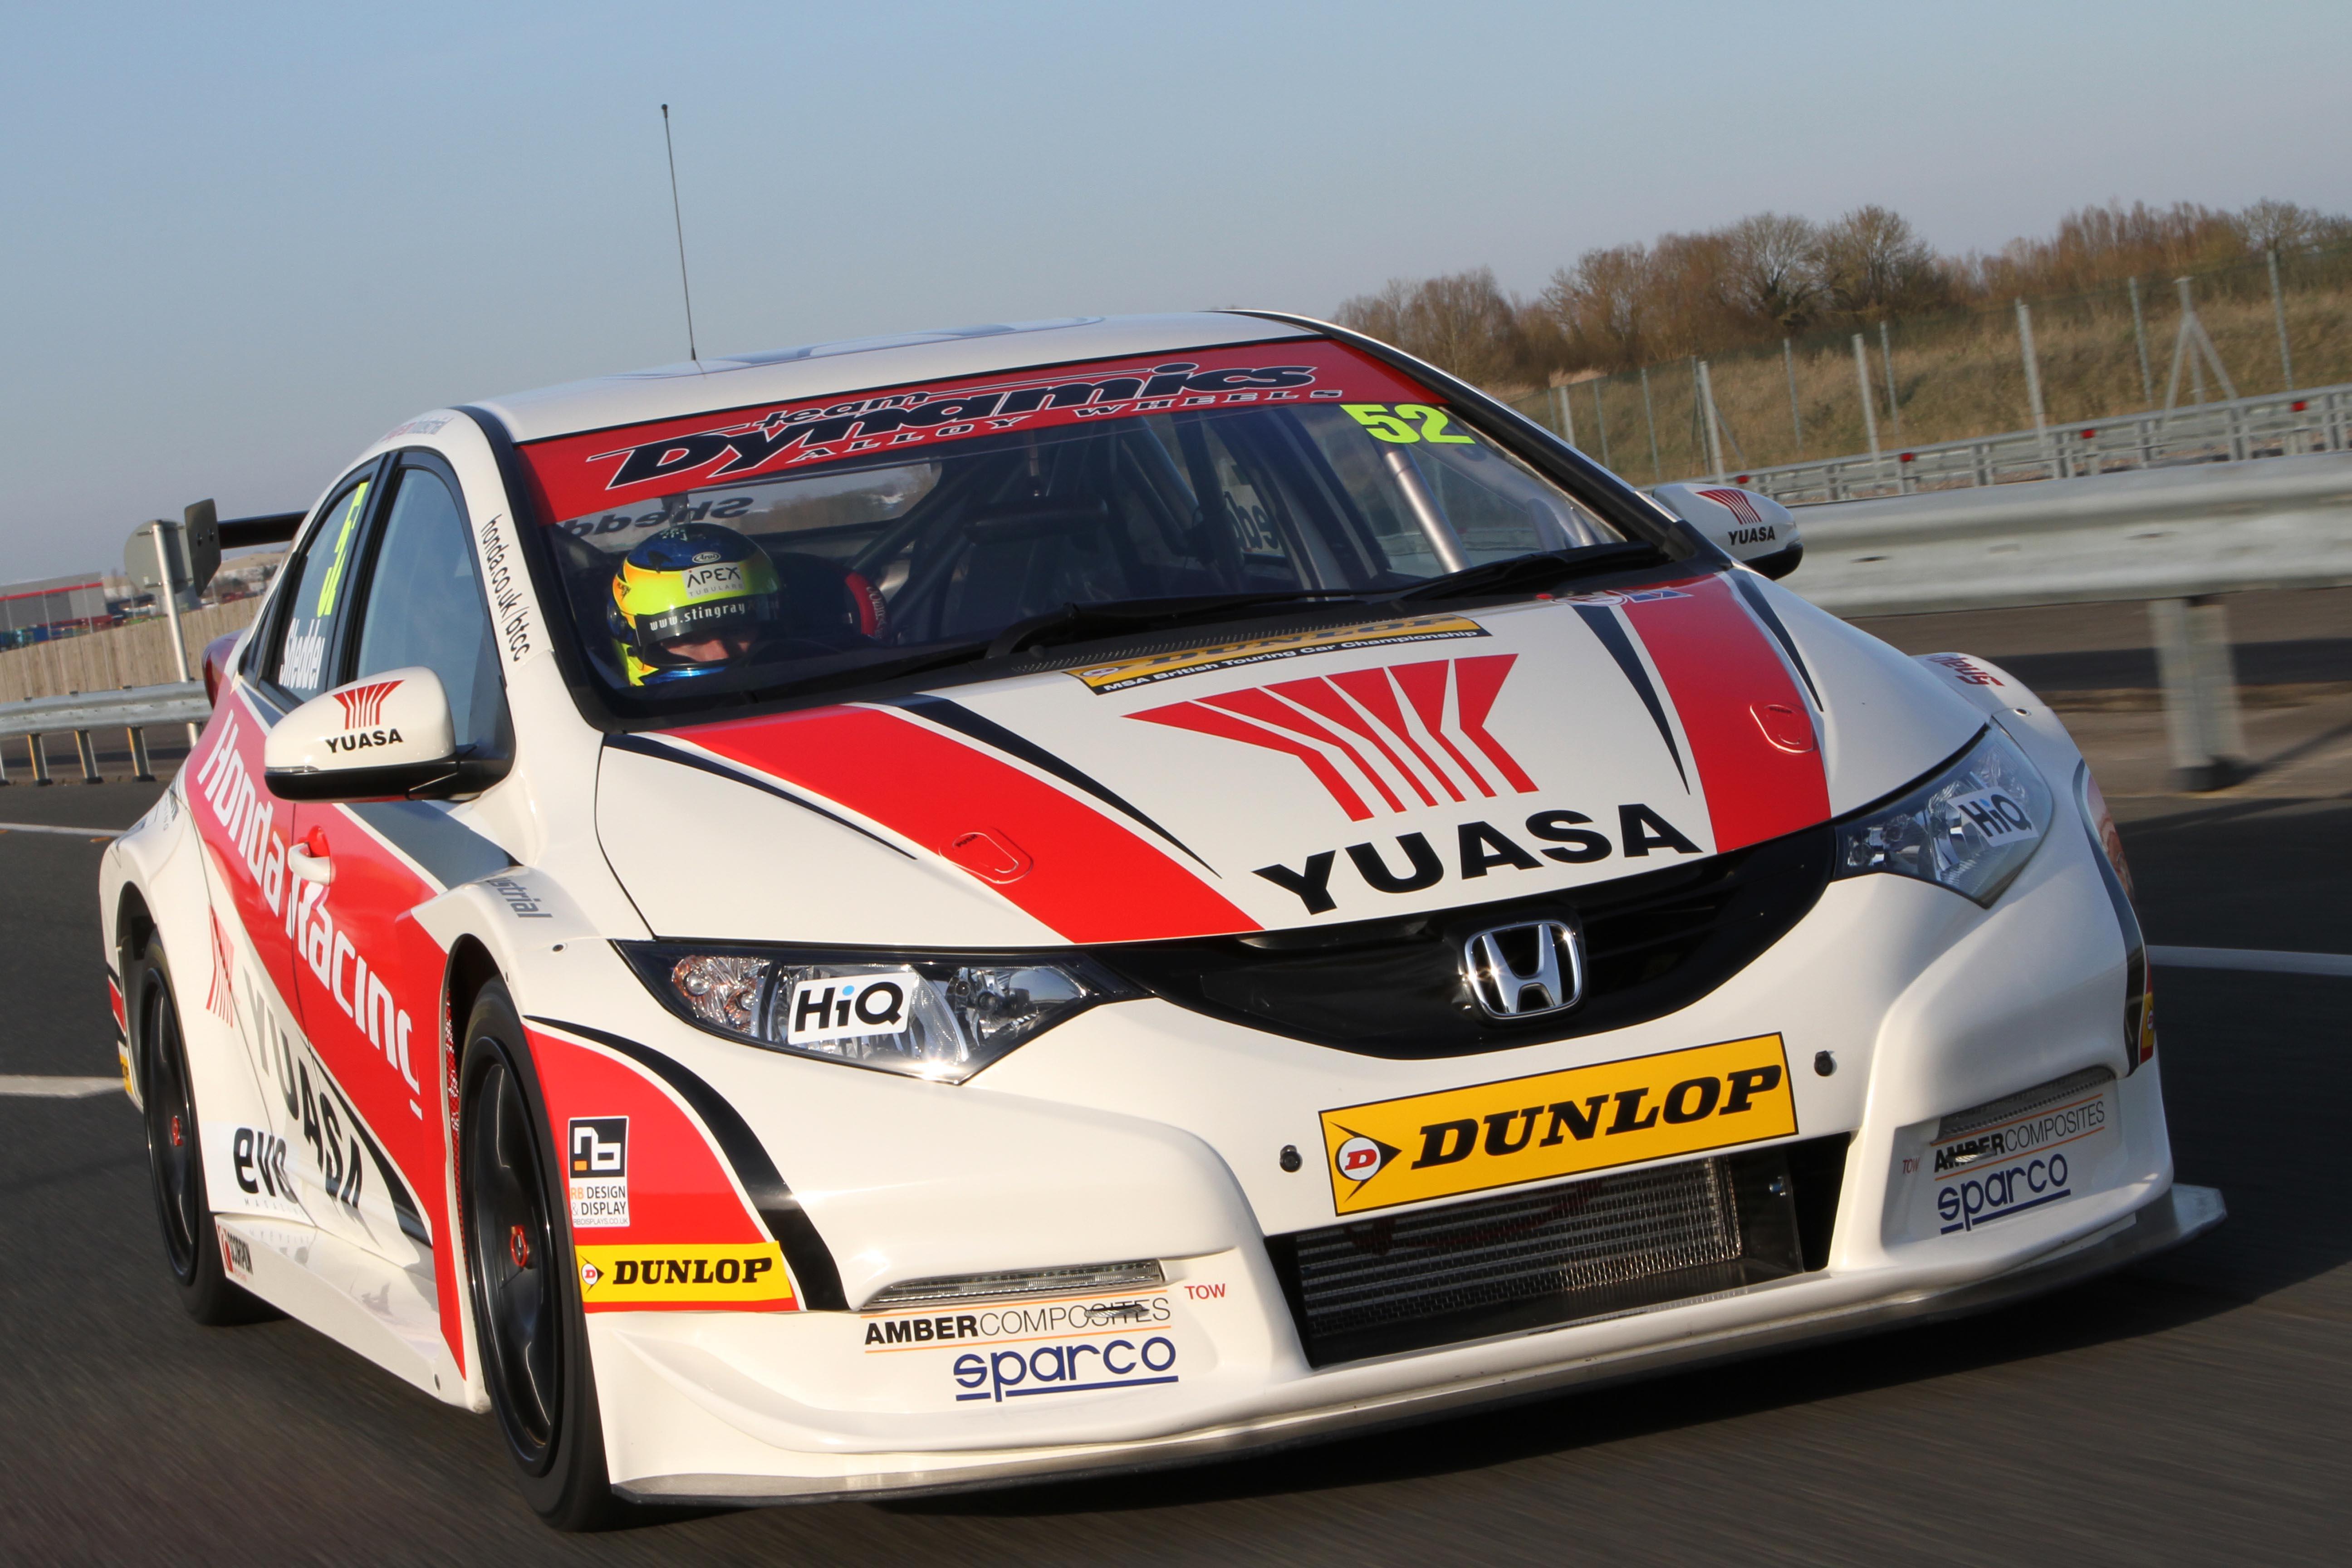 2015 Honda Civic For Sale >> Honda Yuasa Racing Team Chooses Amber Composites Prepreg